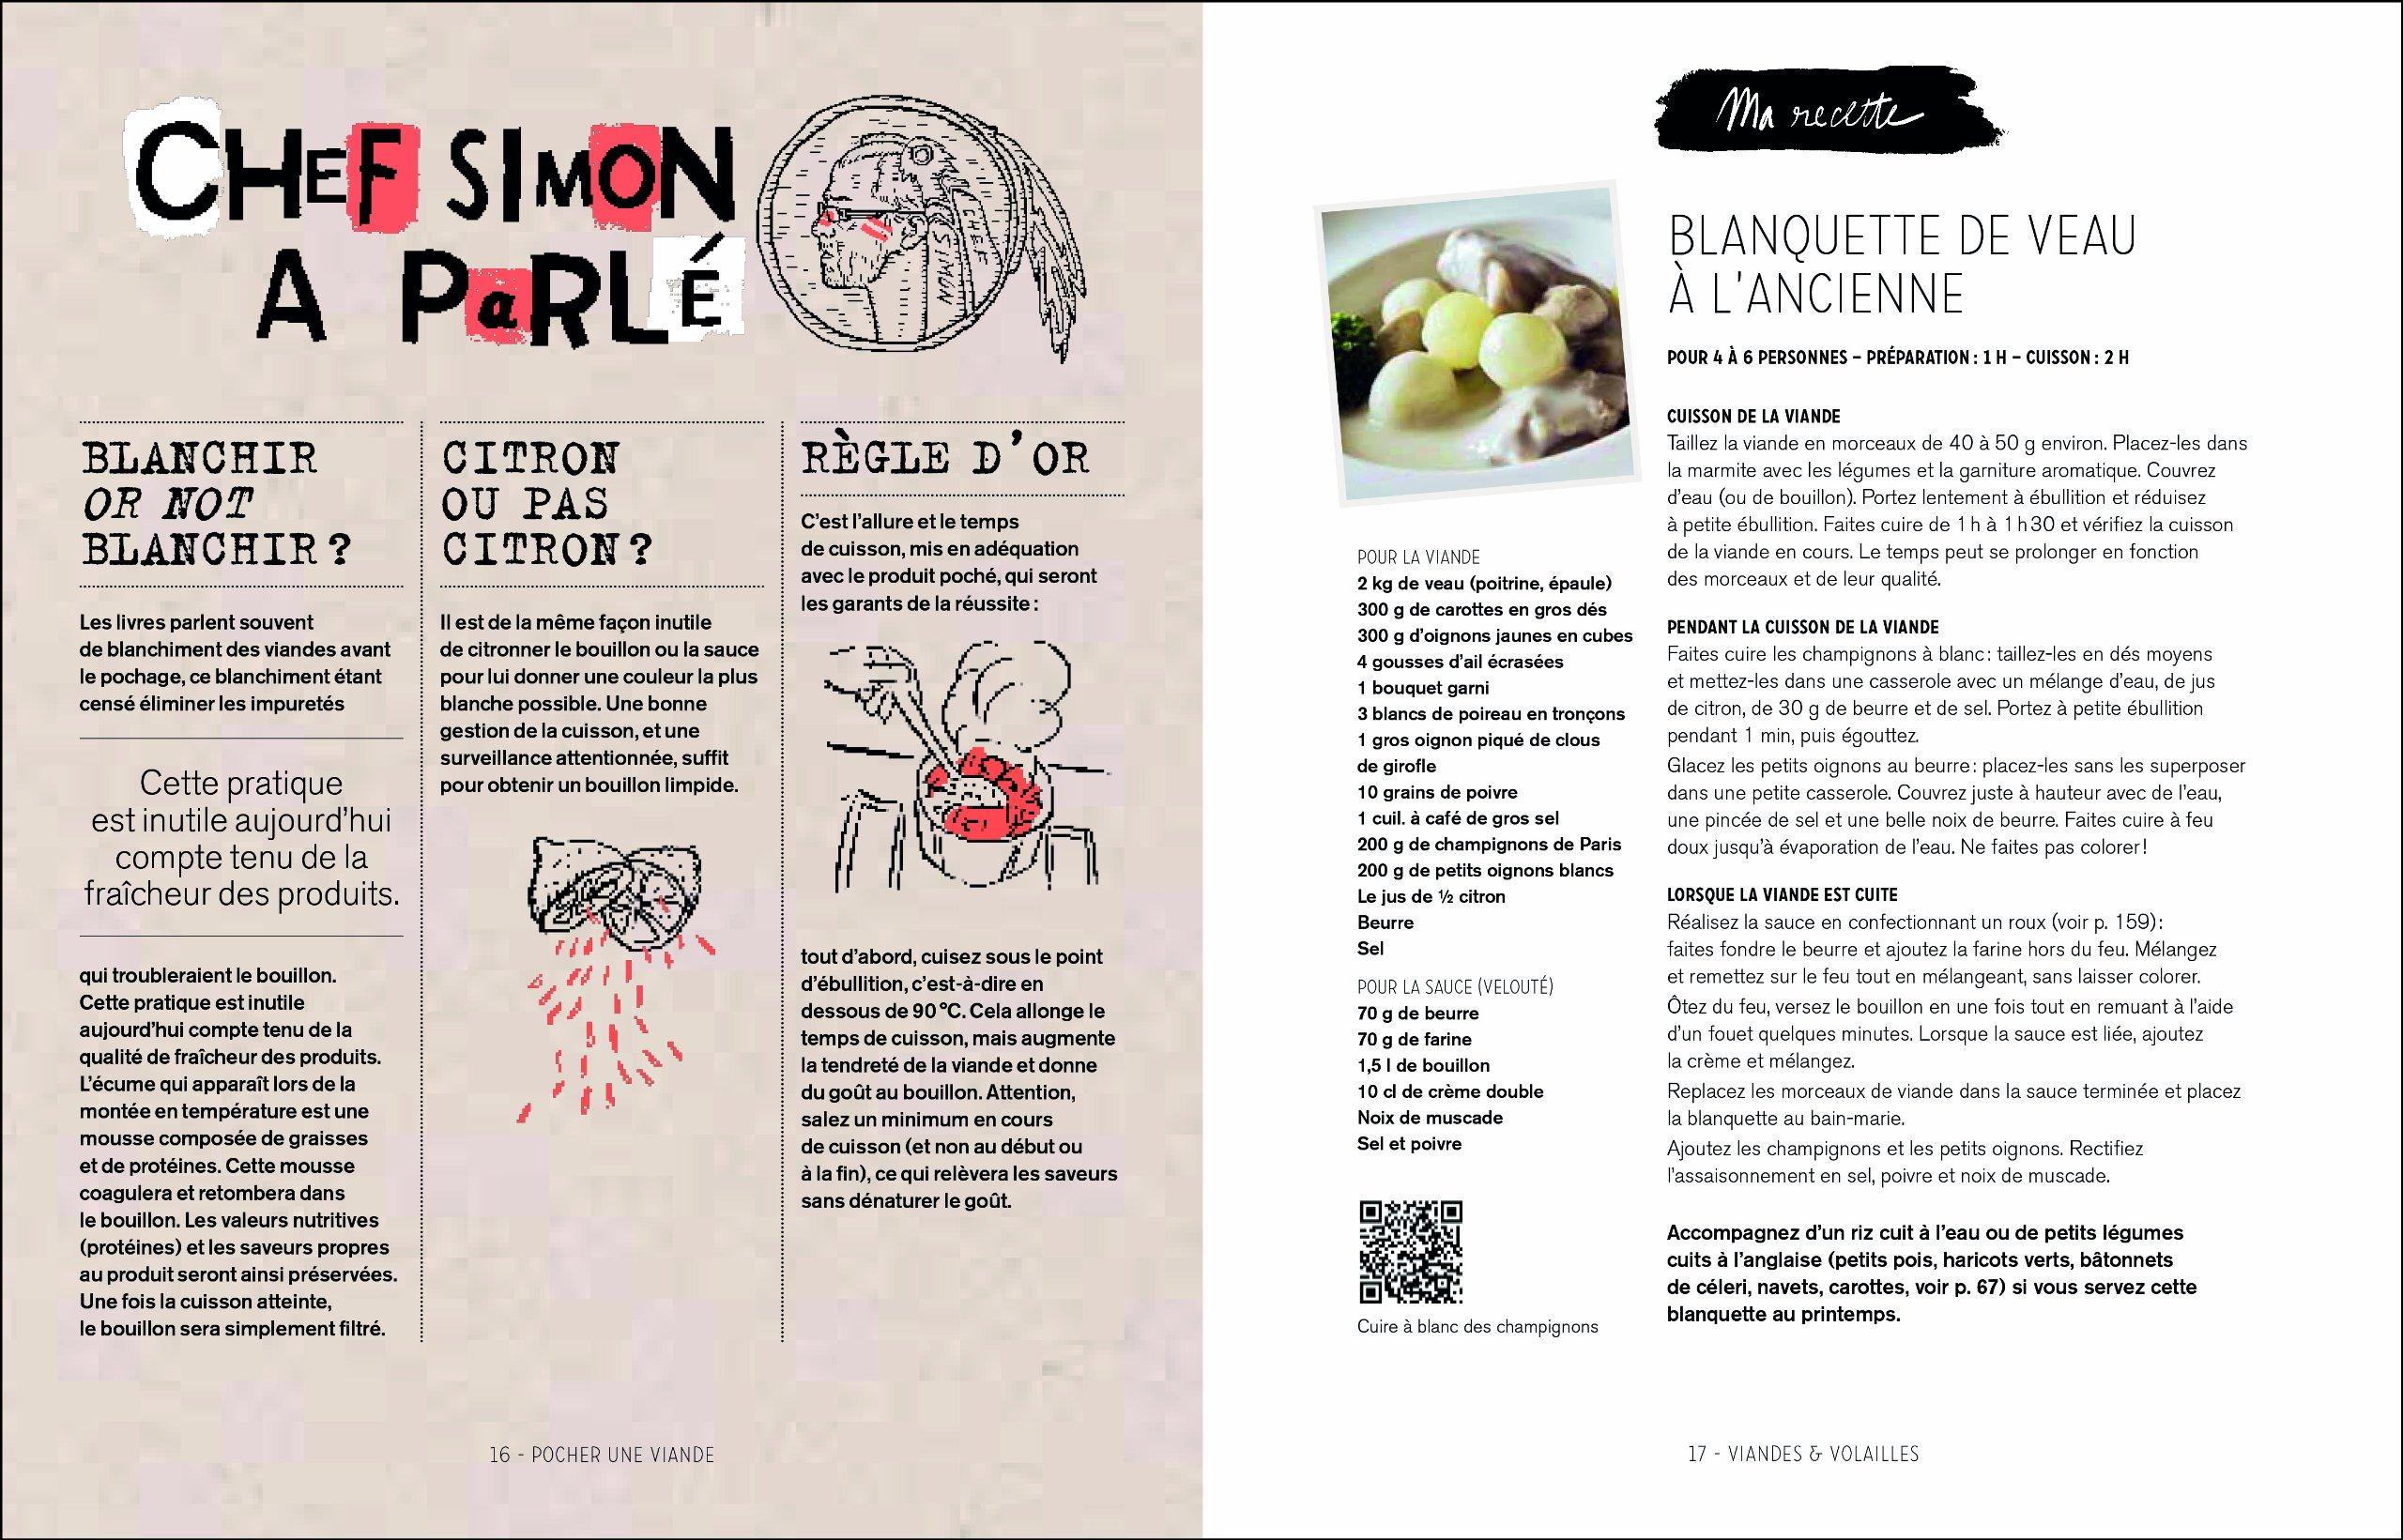 En Cuisine By Chef Simon Hors Collection French Edition Simon Bertrand Simon Sabine Aseyn Portos Michel Bertron Patrick 9782812308543 Books